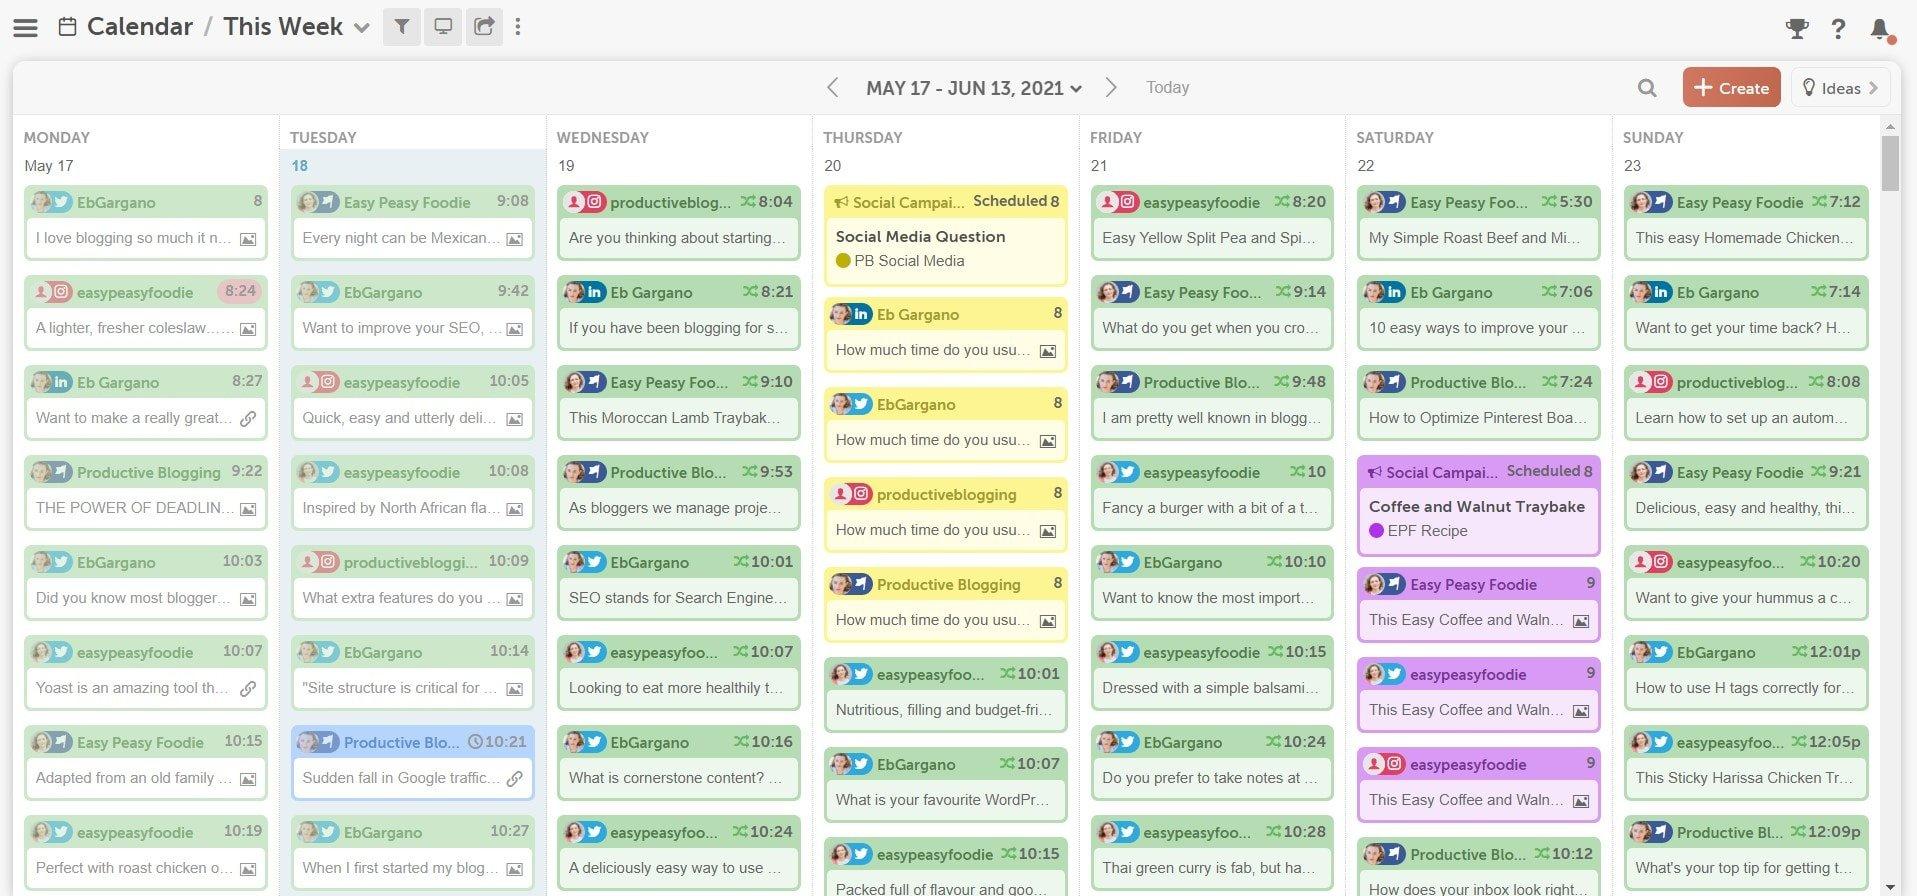 CoSchedule Marketing Calendar